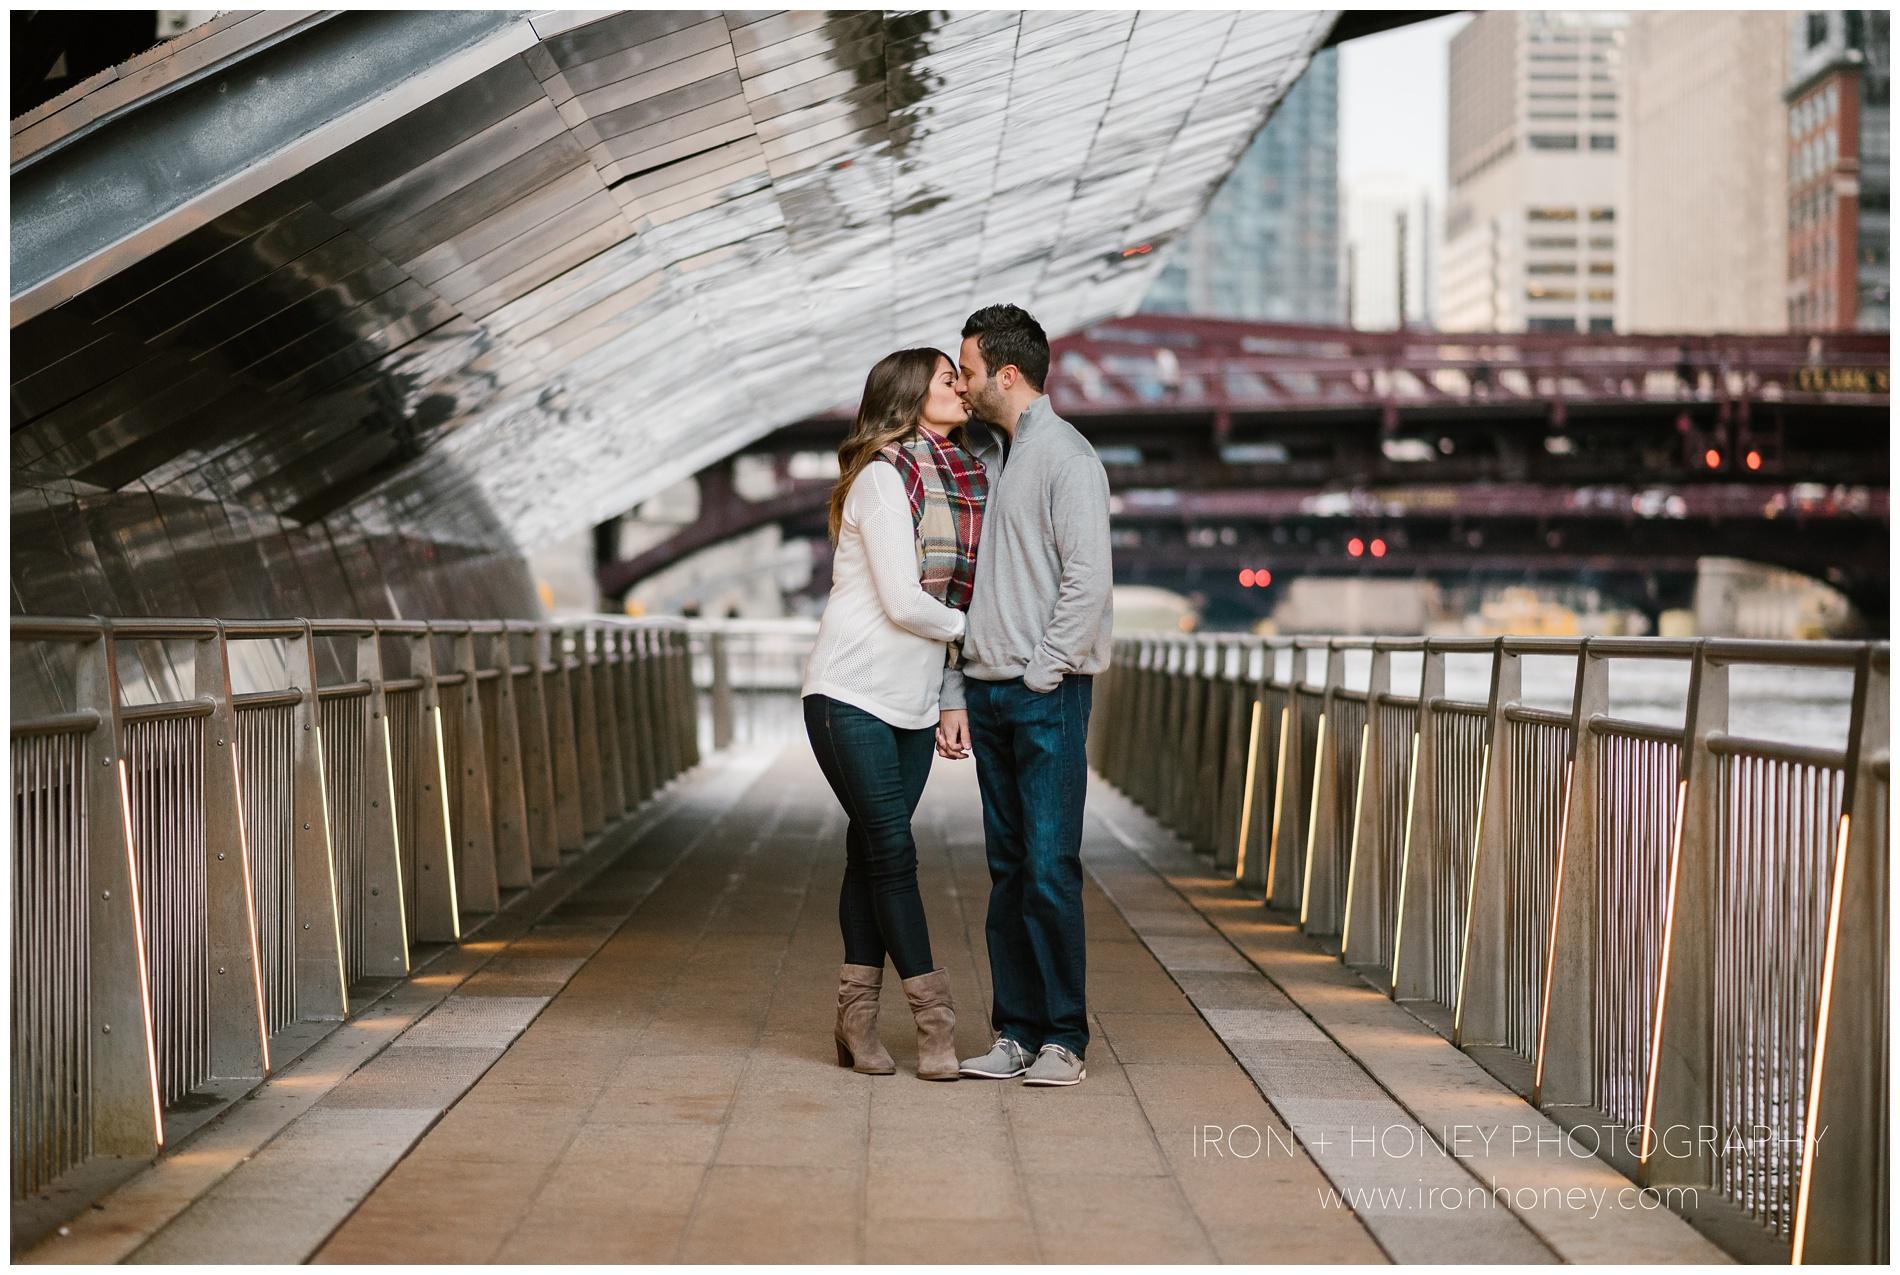 chicago riverwalk engagement session, iron and honey, melissa ferrara, chicago engagement photographer, chicago wedding photographer, chicago riverwalk